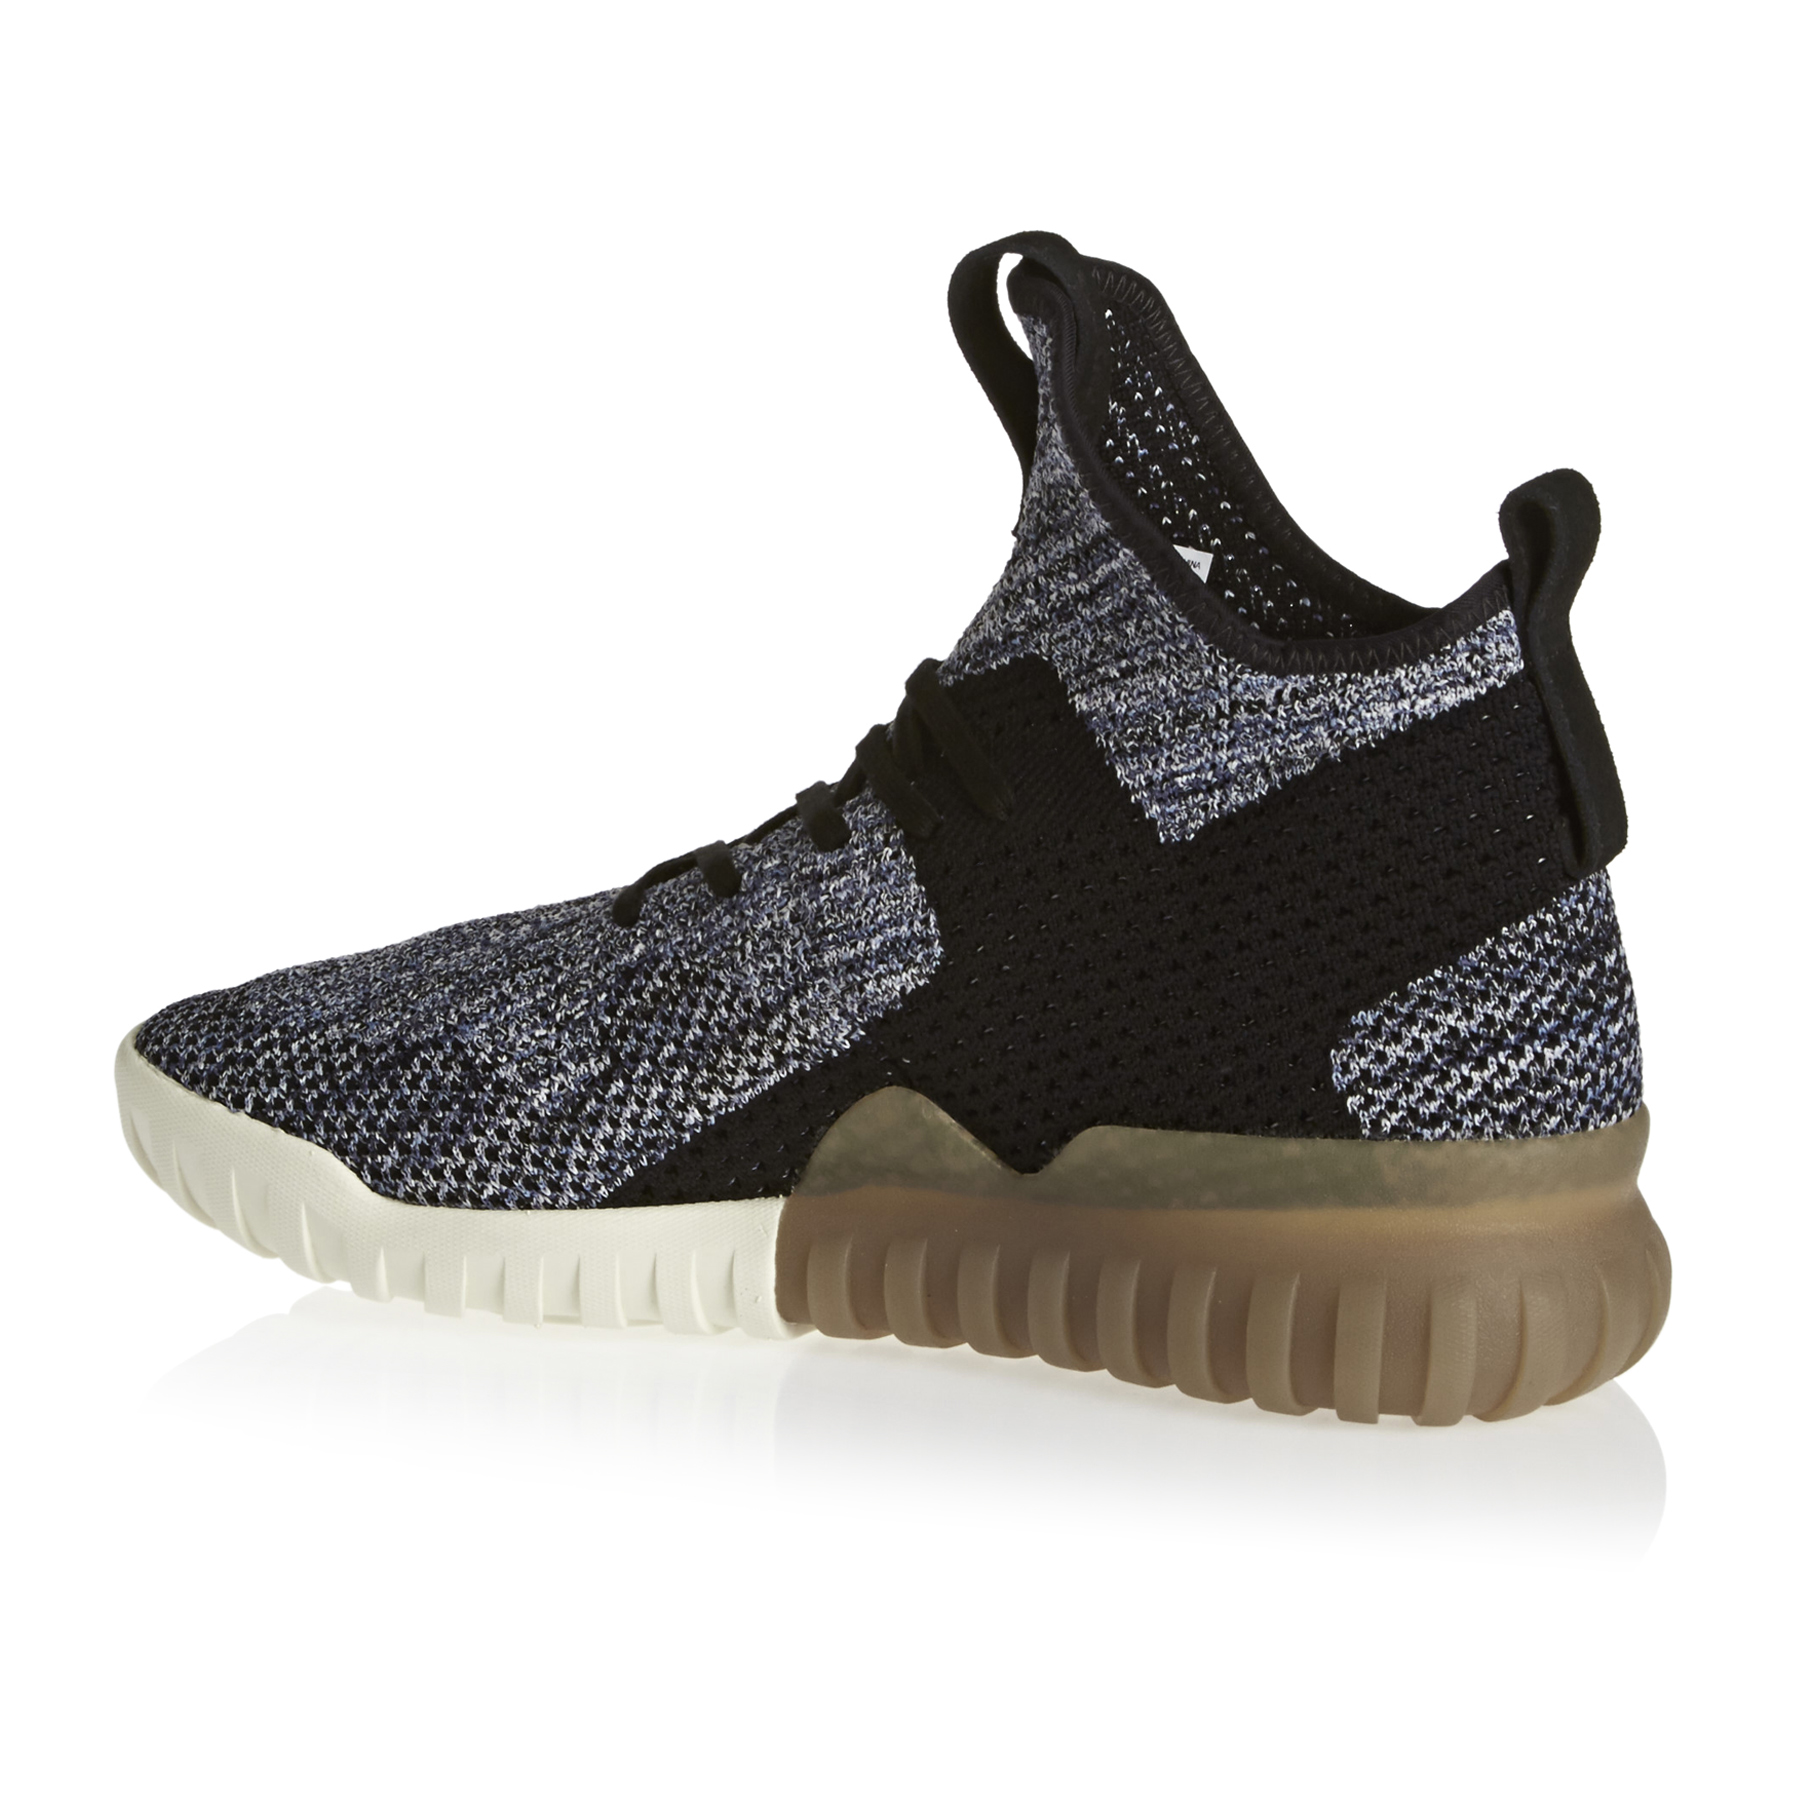 Adidas Originals Tubular X Primeknit Shoes | Free Delivery